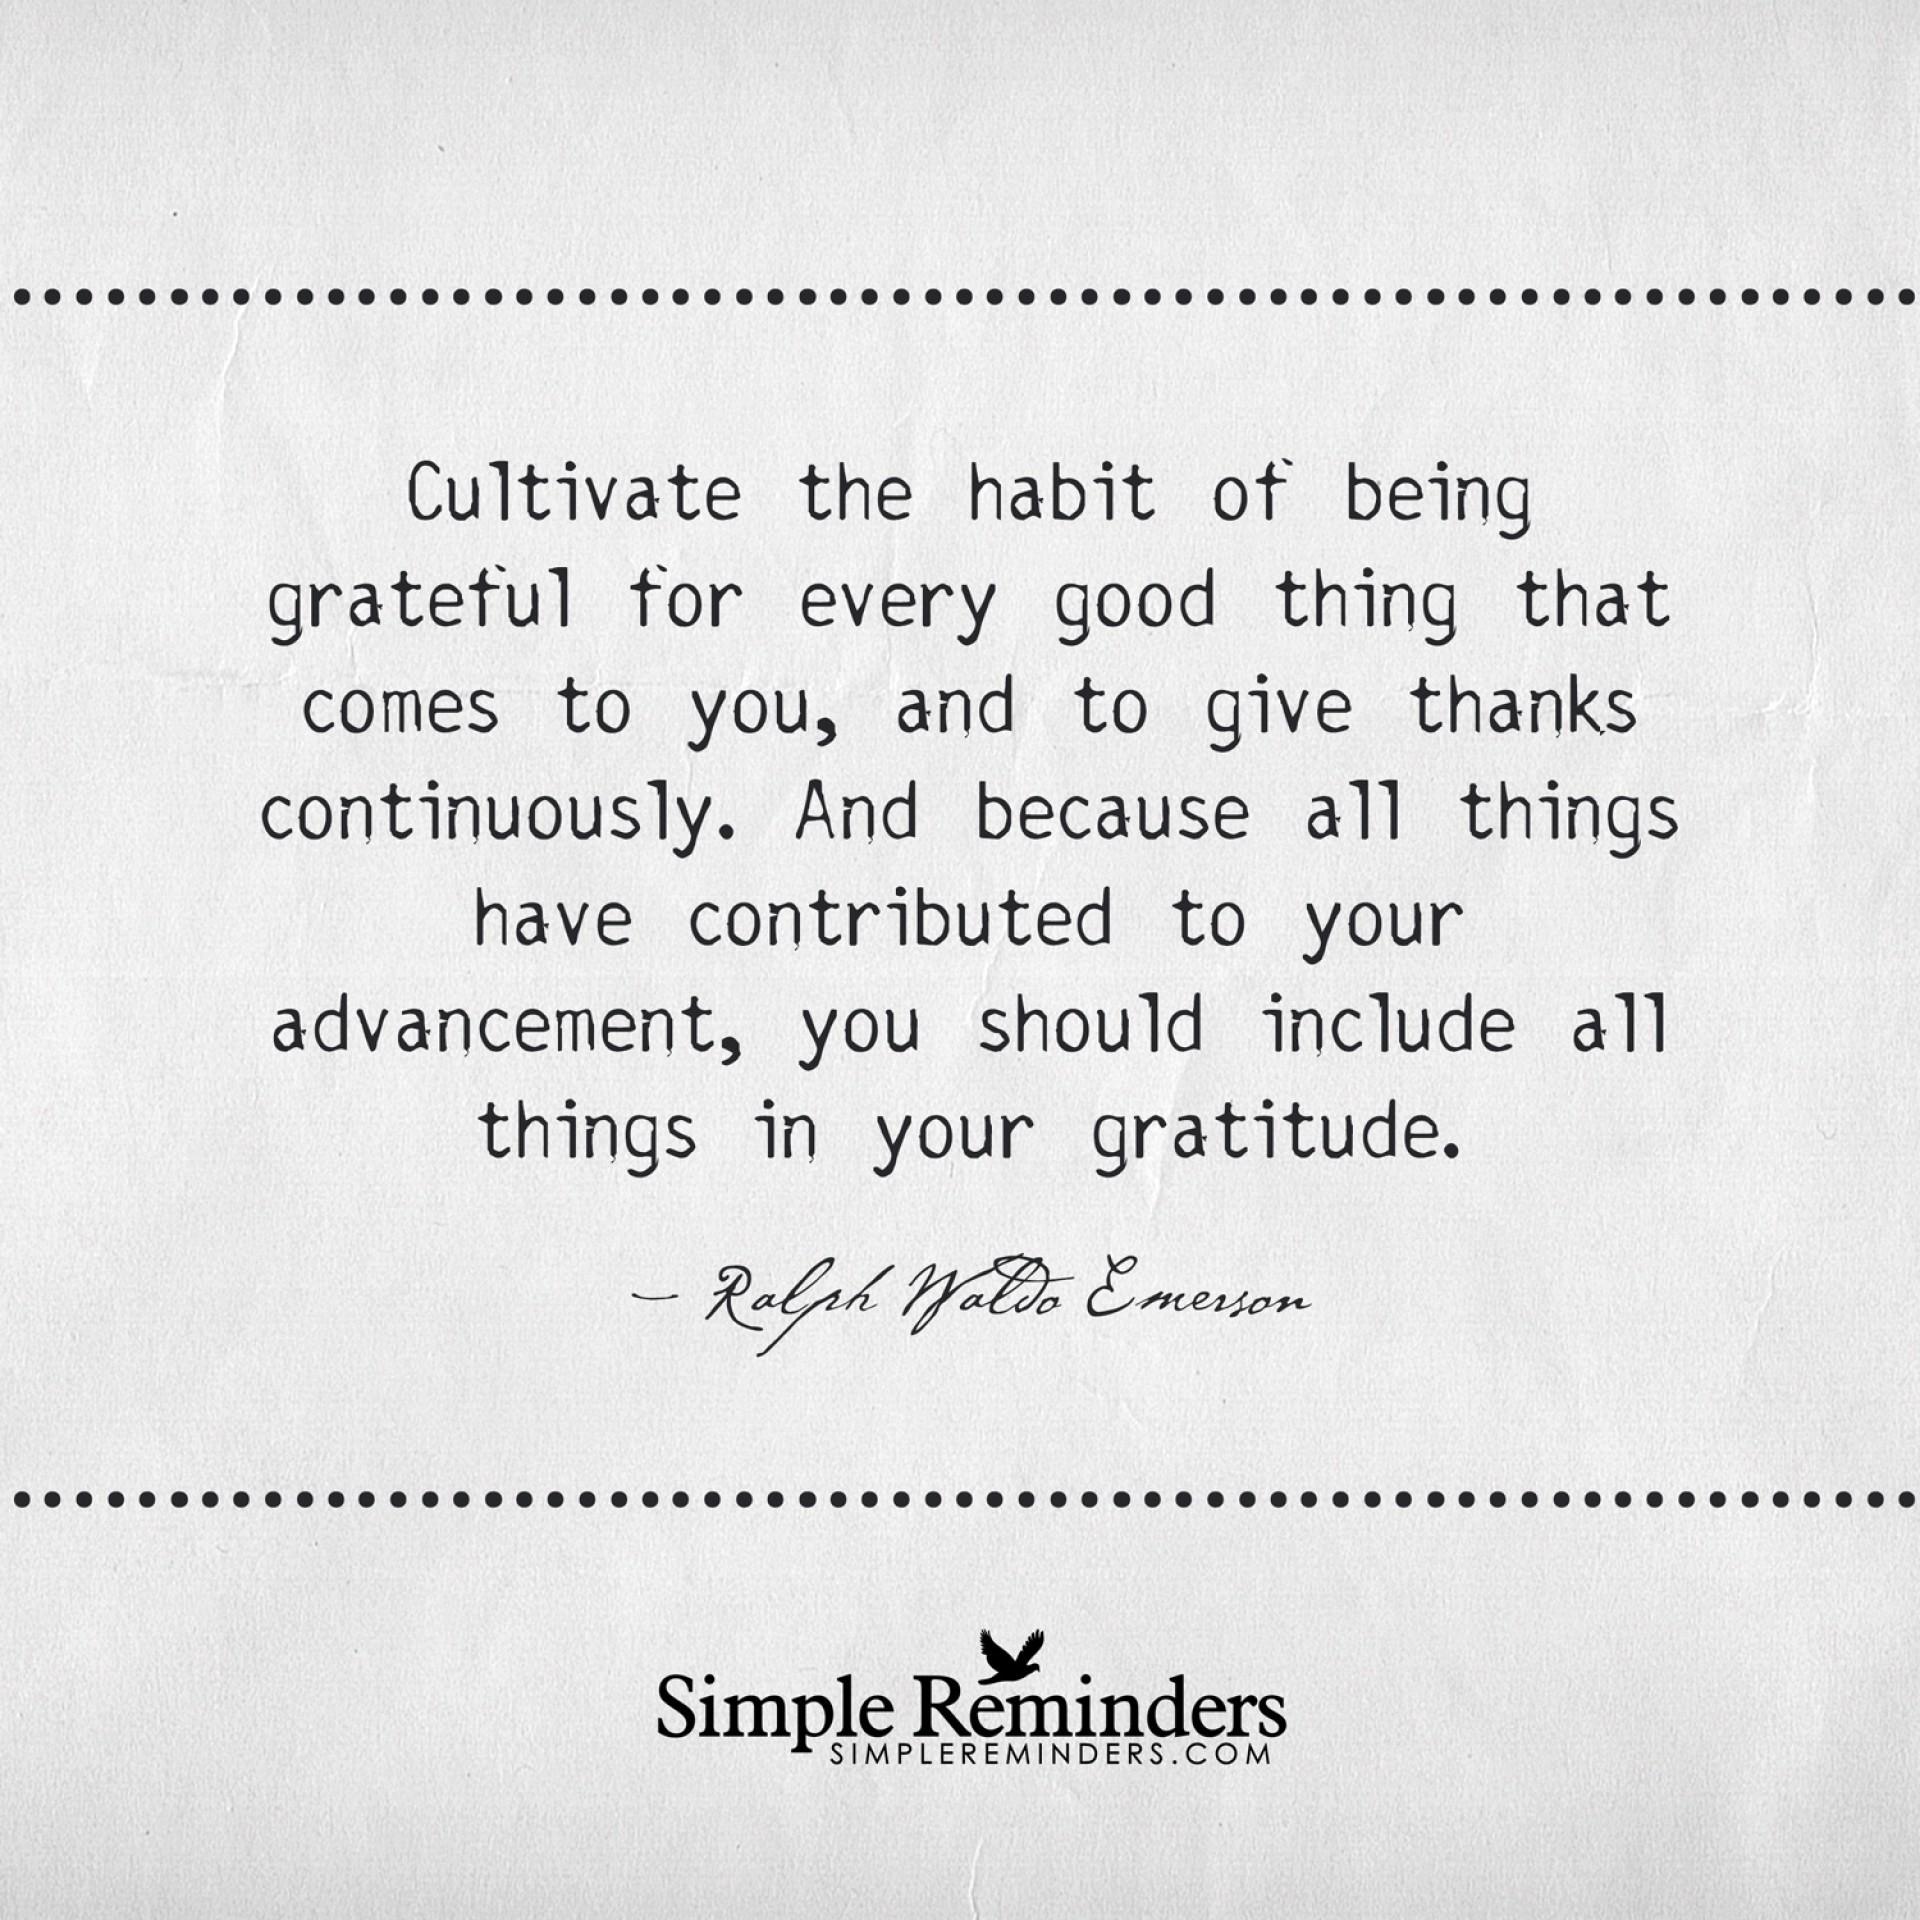 012 Essay Example Ralph Waldo Emerson Cultivate Habit Gratitude 4r5t Dreaded Essays Pdf First Series Summary Nature 1920